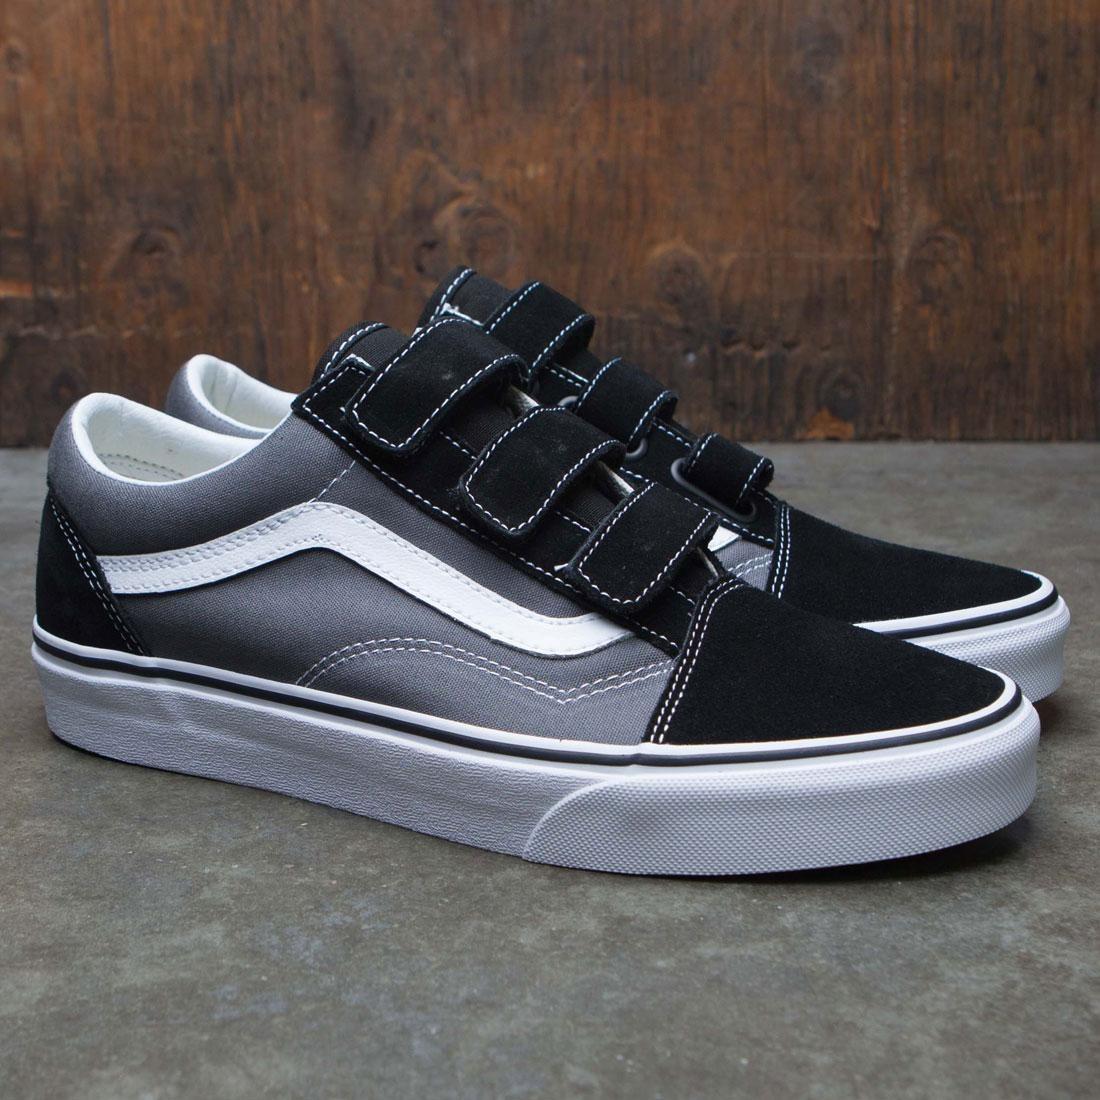 Vans Men Old Skool V gray pewter black